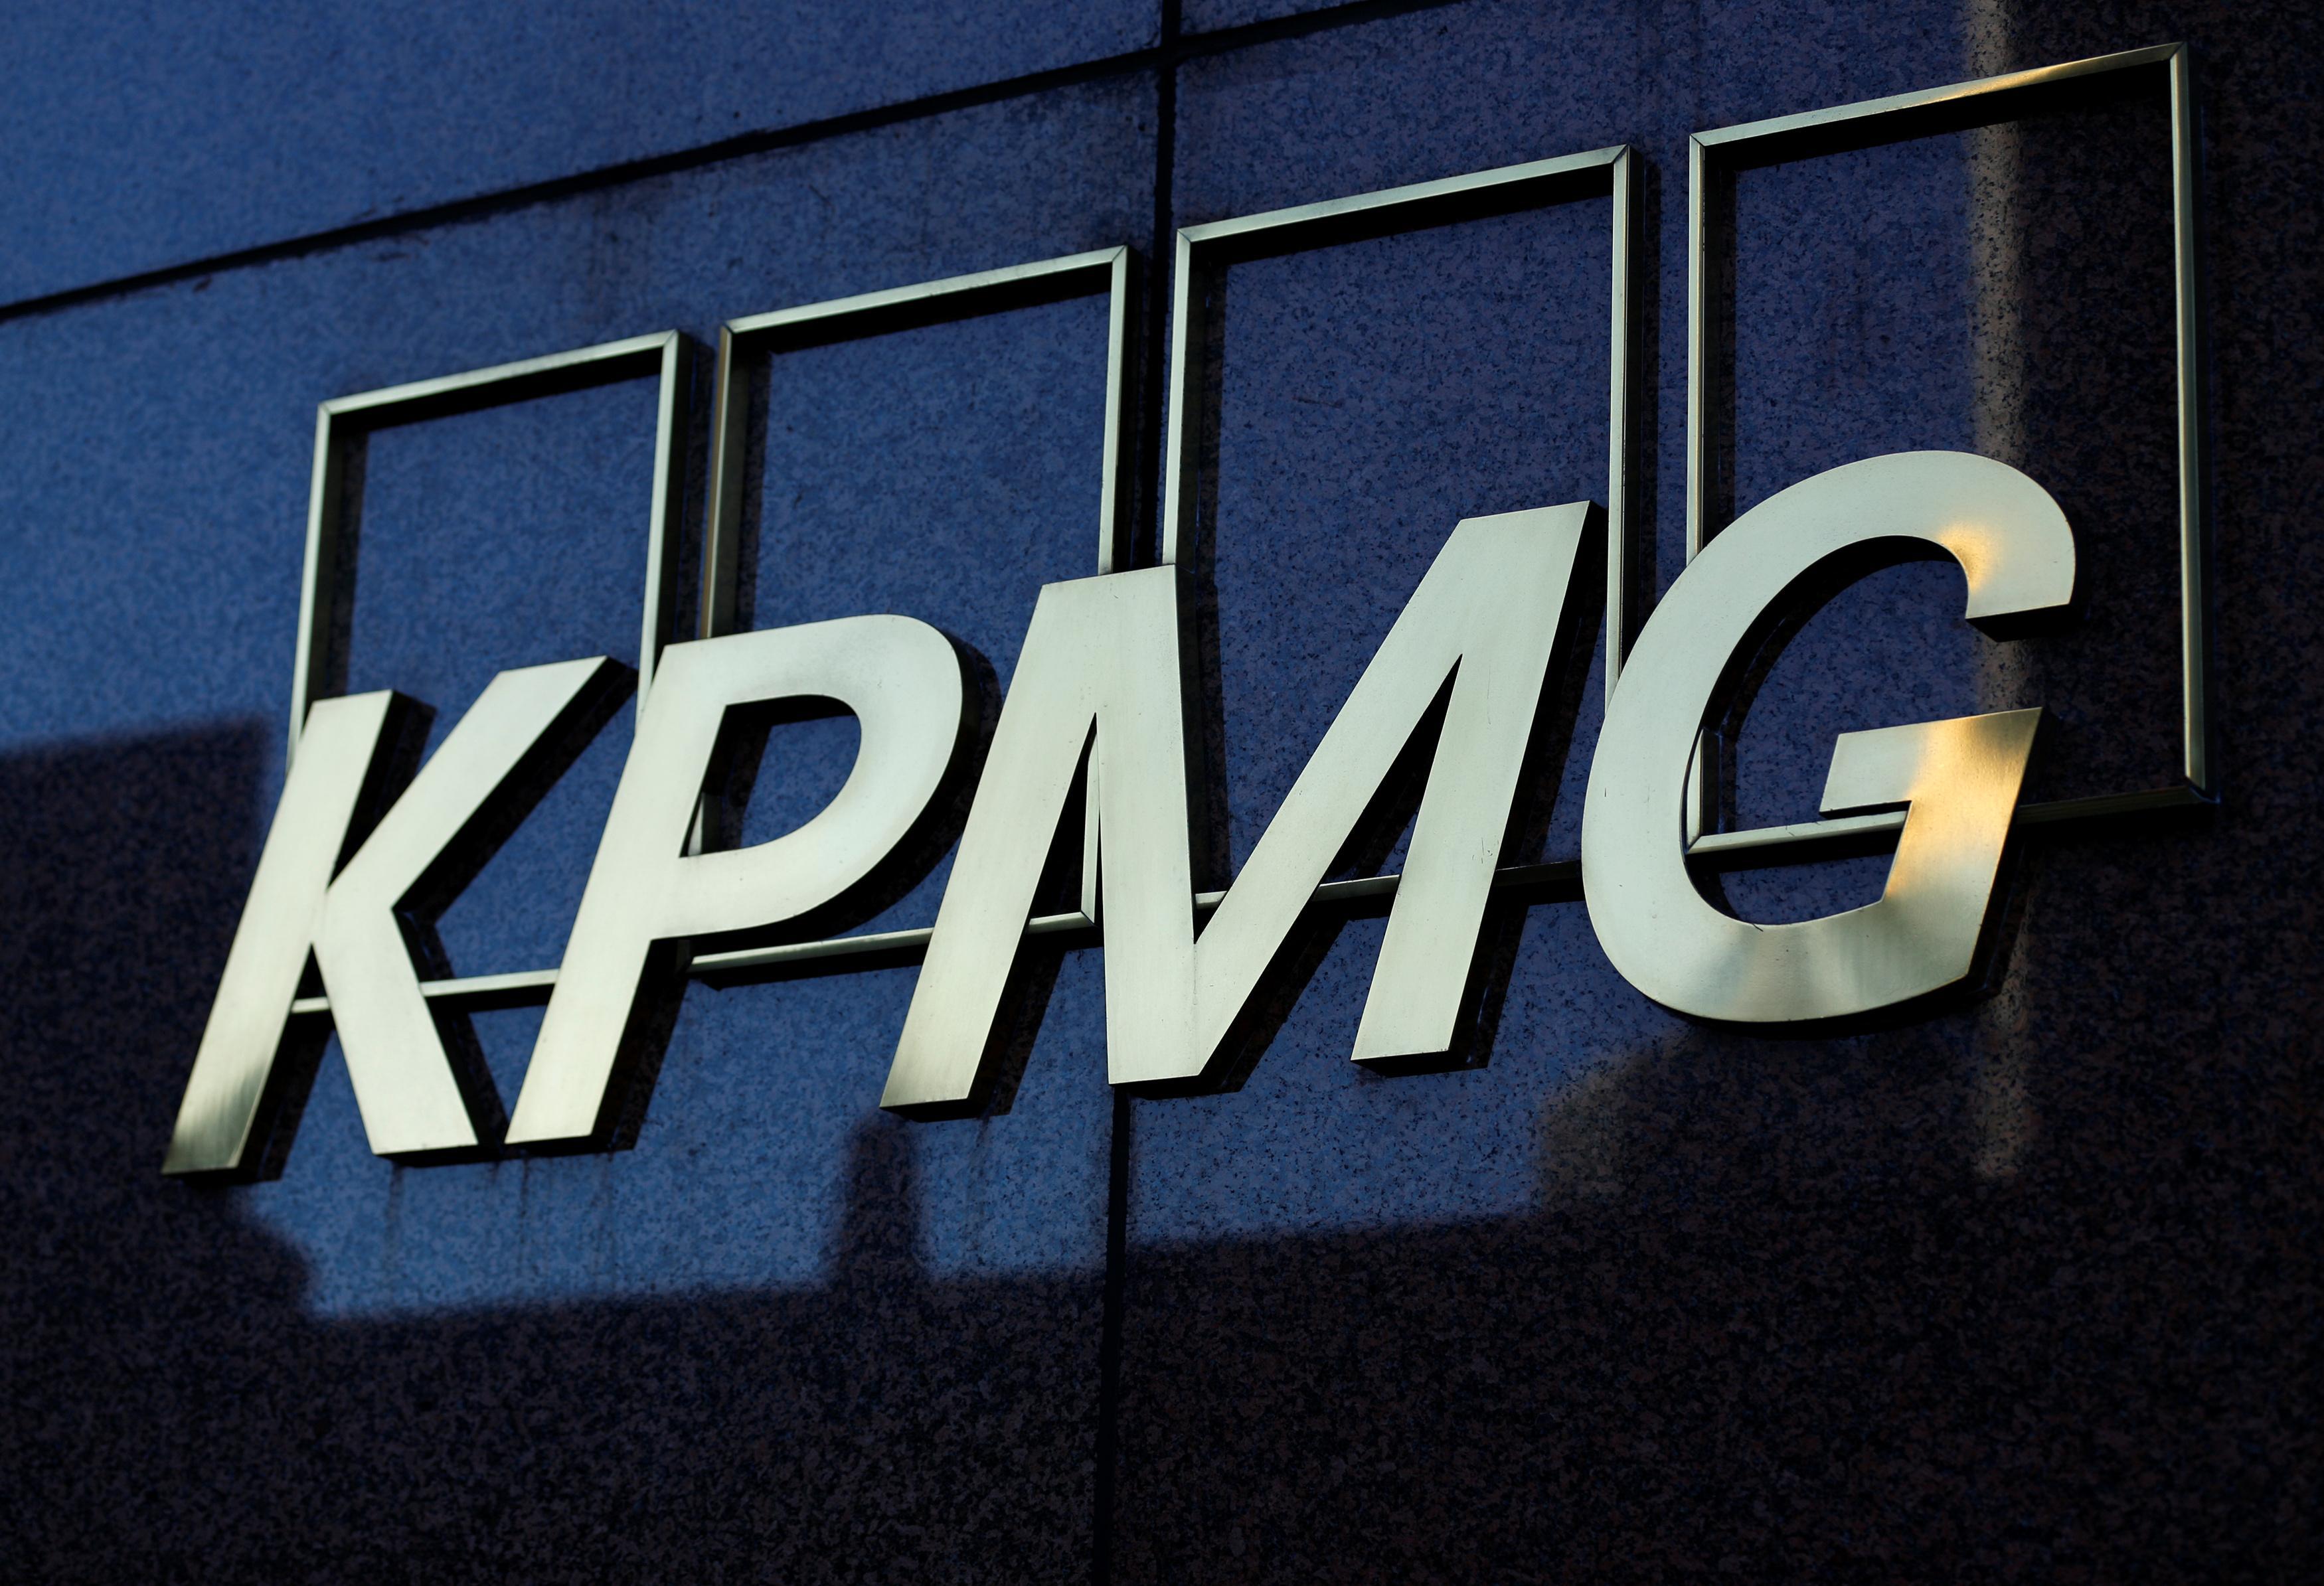 KPMG to pay $50 million for using stolen data, exam fraud: U.S. SEC